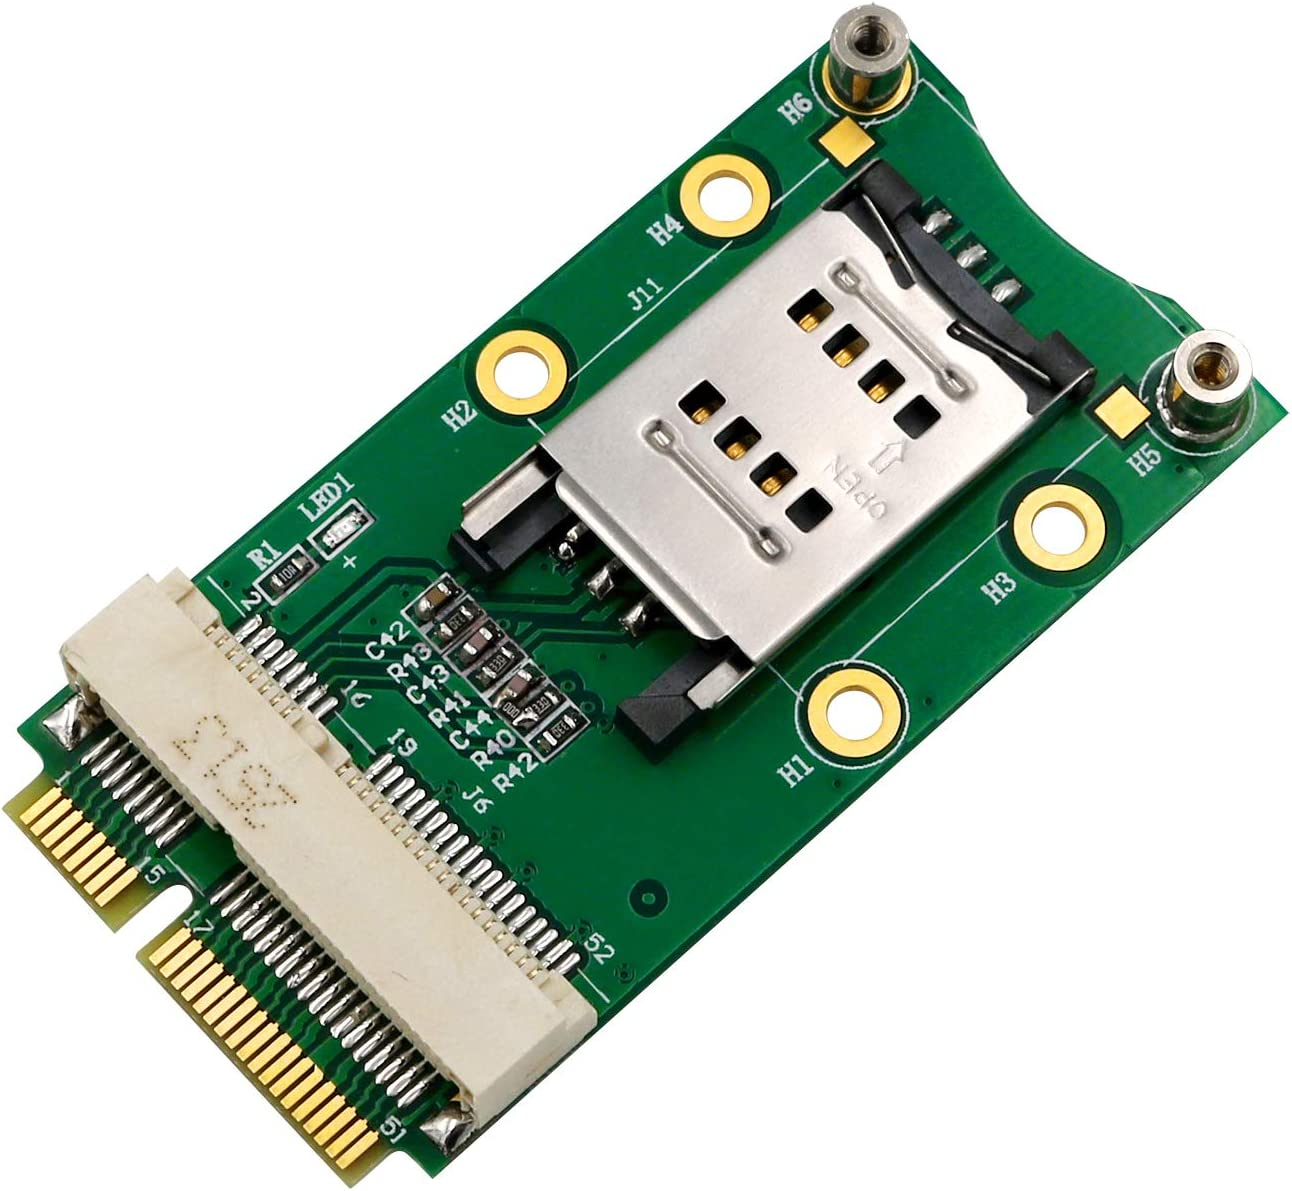 SUPERPLUS Mini PCI-E Adapter with SIM Card Slot for 3G/4G,WWAN LTE,GPS Card (Clamshell SIM Card Holder)